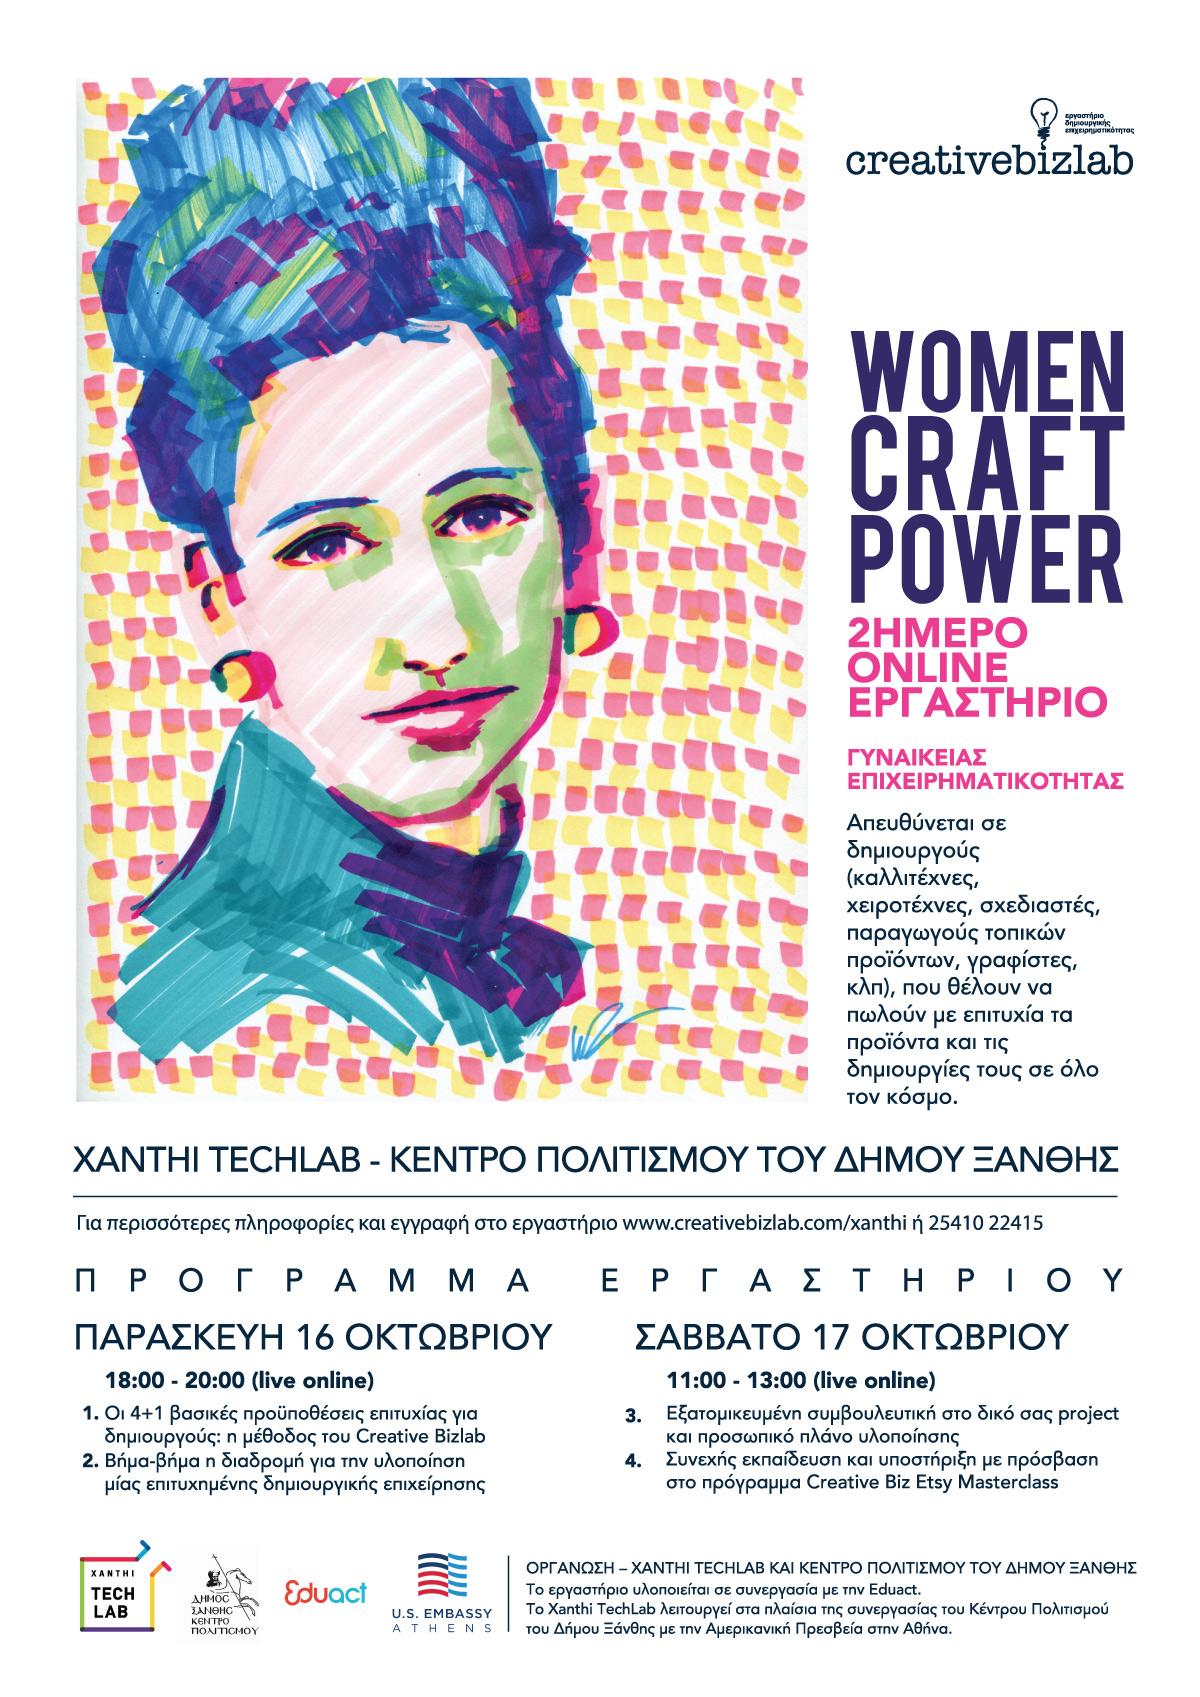 Online 2ήμερο εργαστήριο γυναικείας επιχειρηματικότητας. Χanthi Techlab